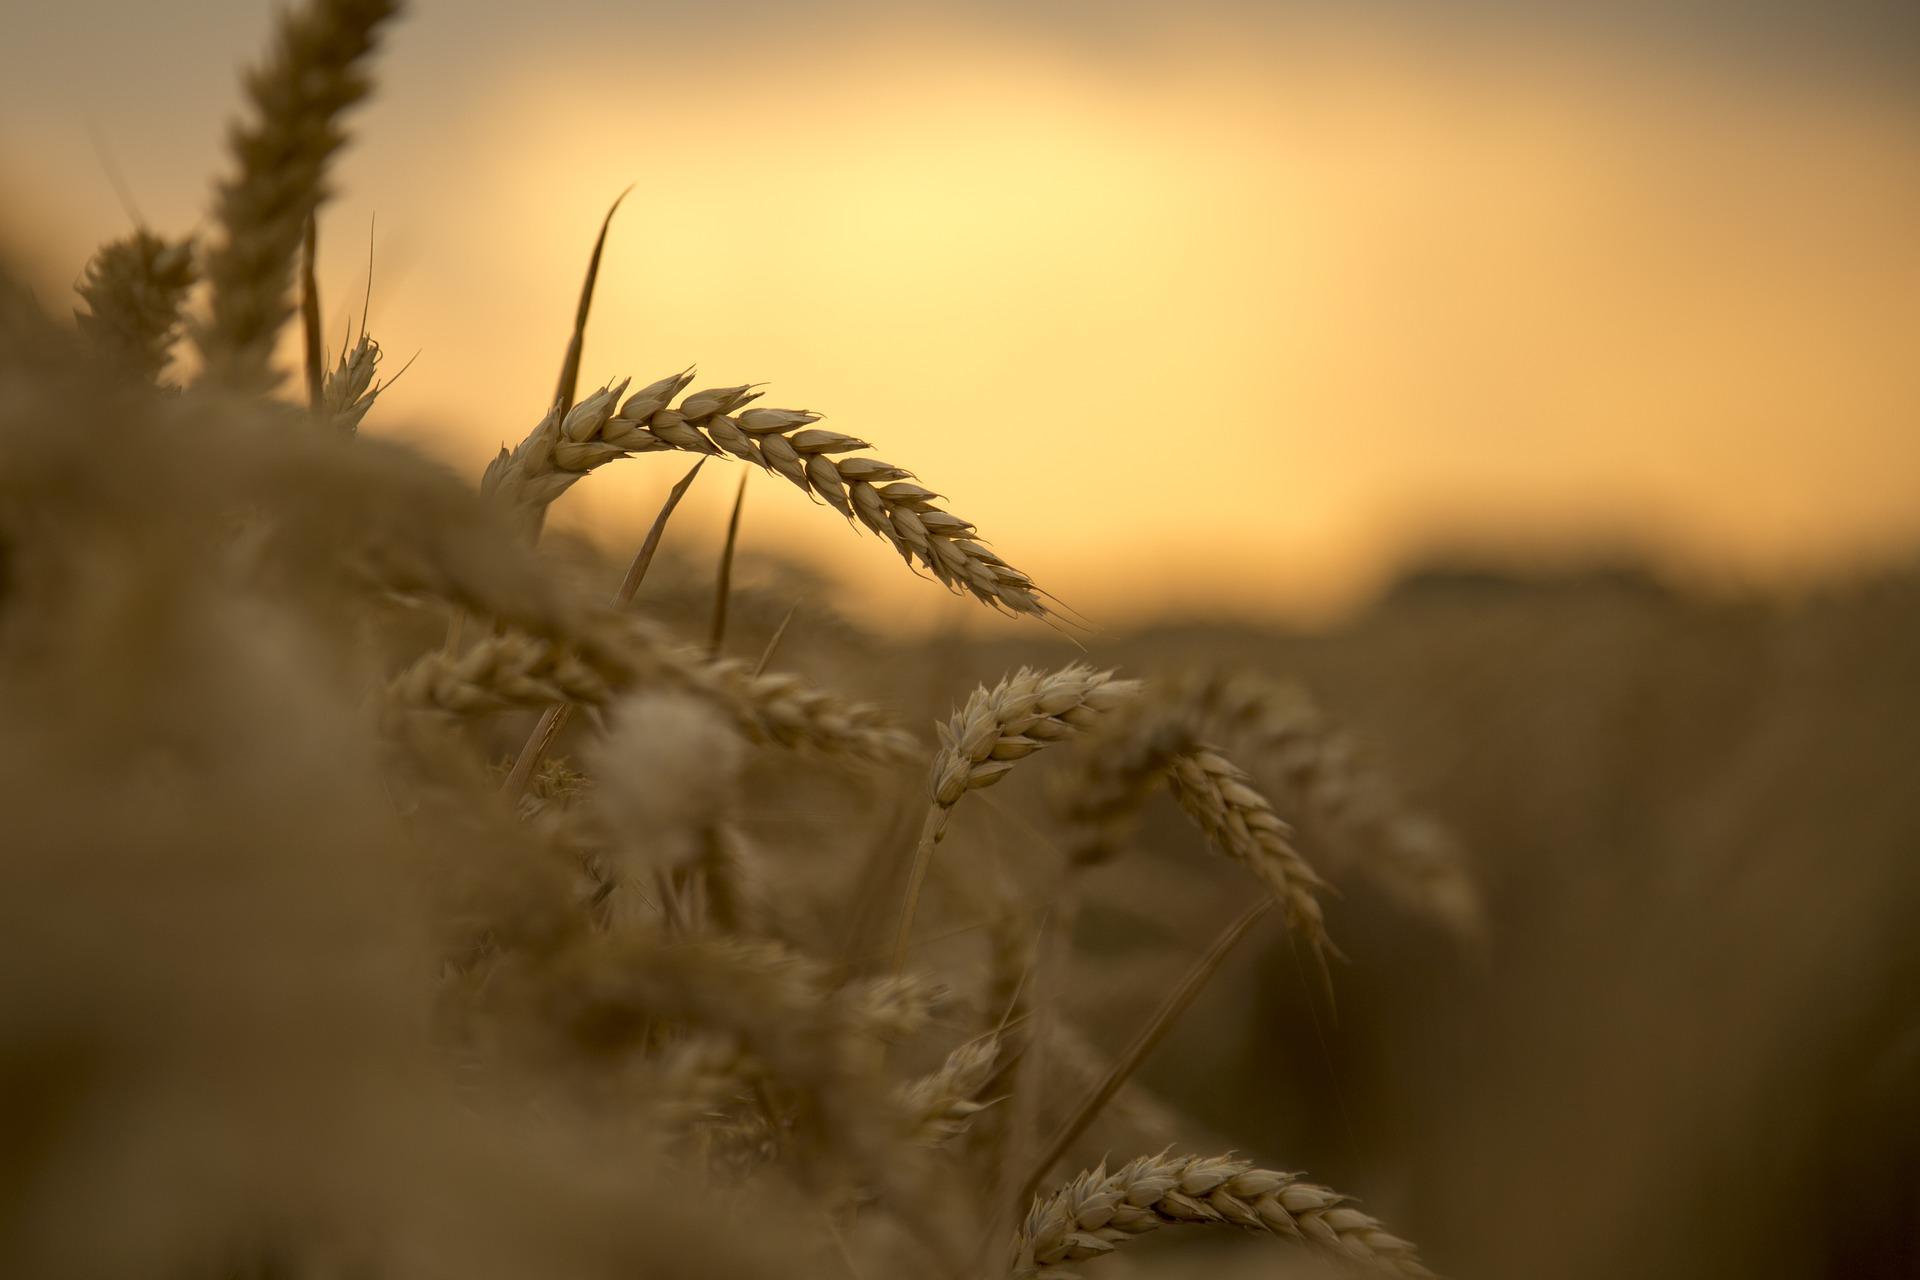 wheat-3534233_1920.jpg